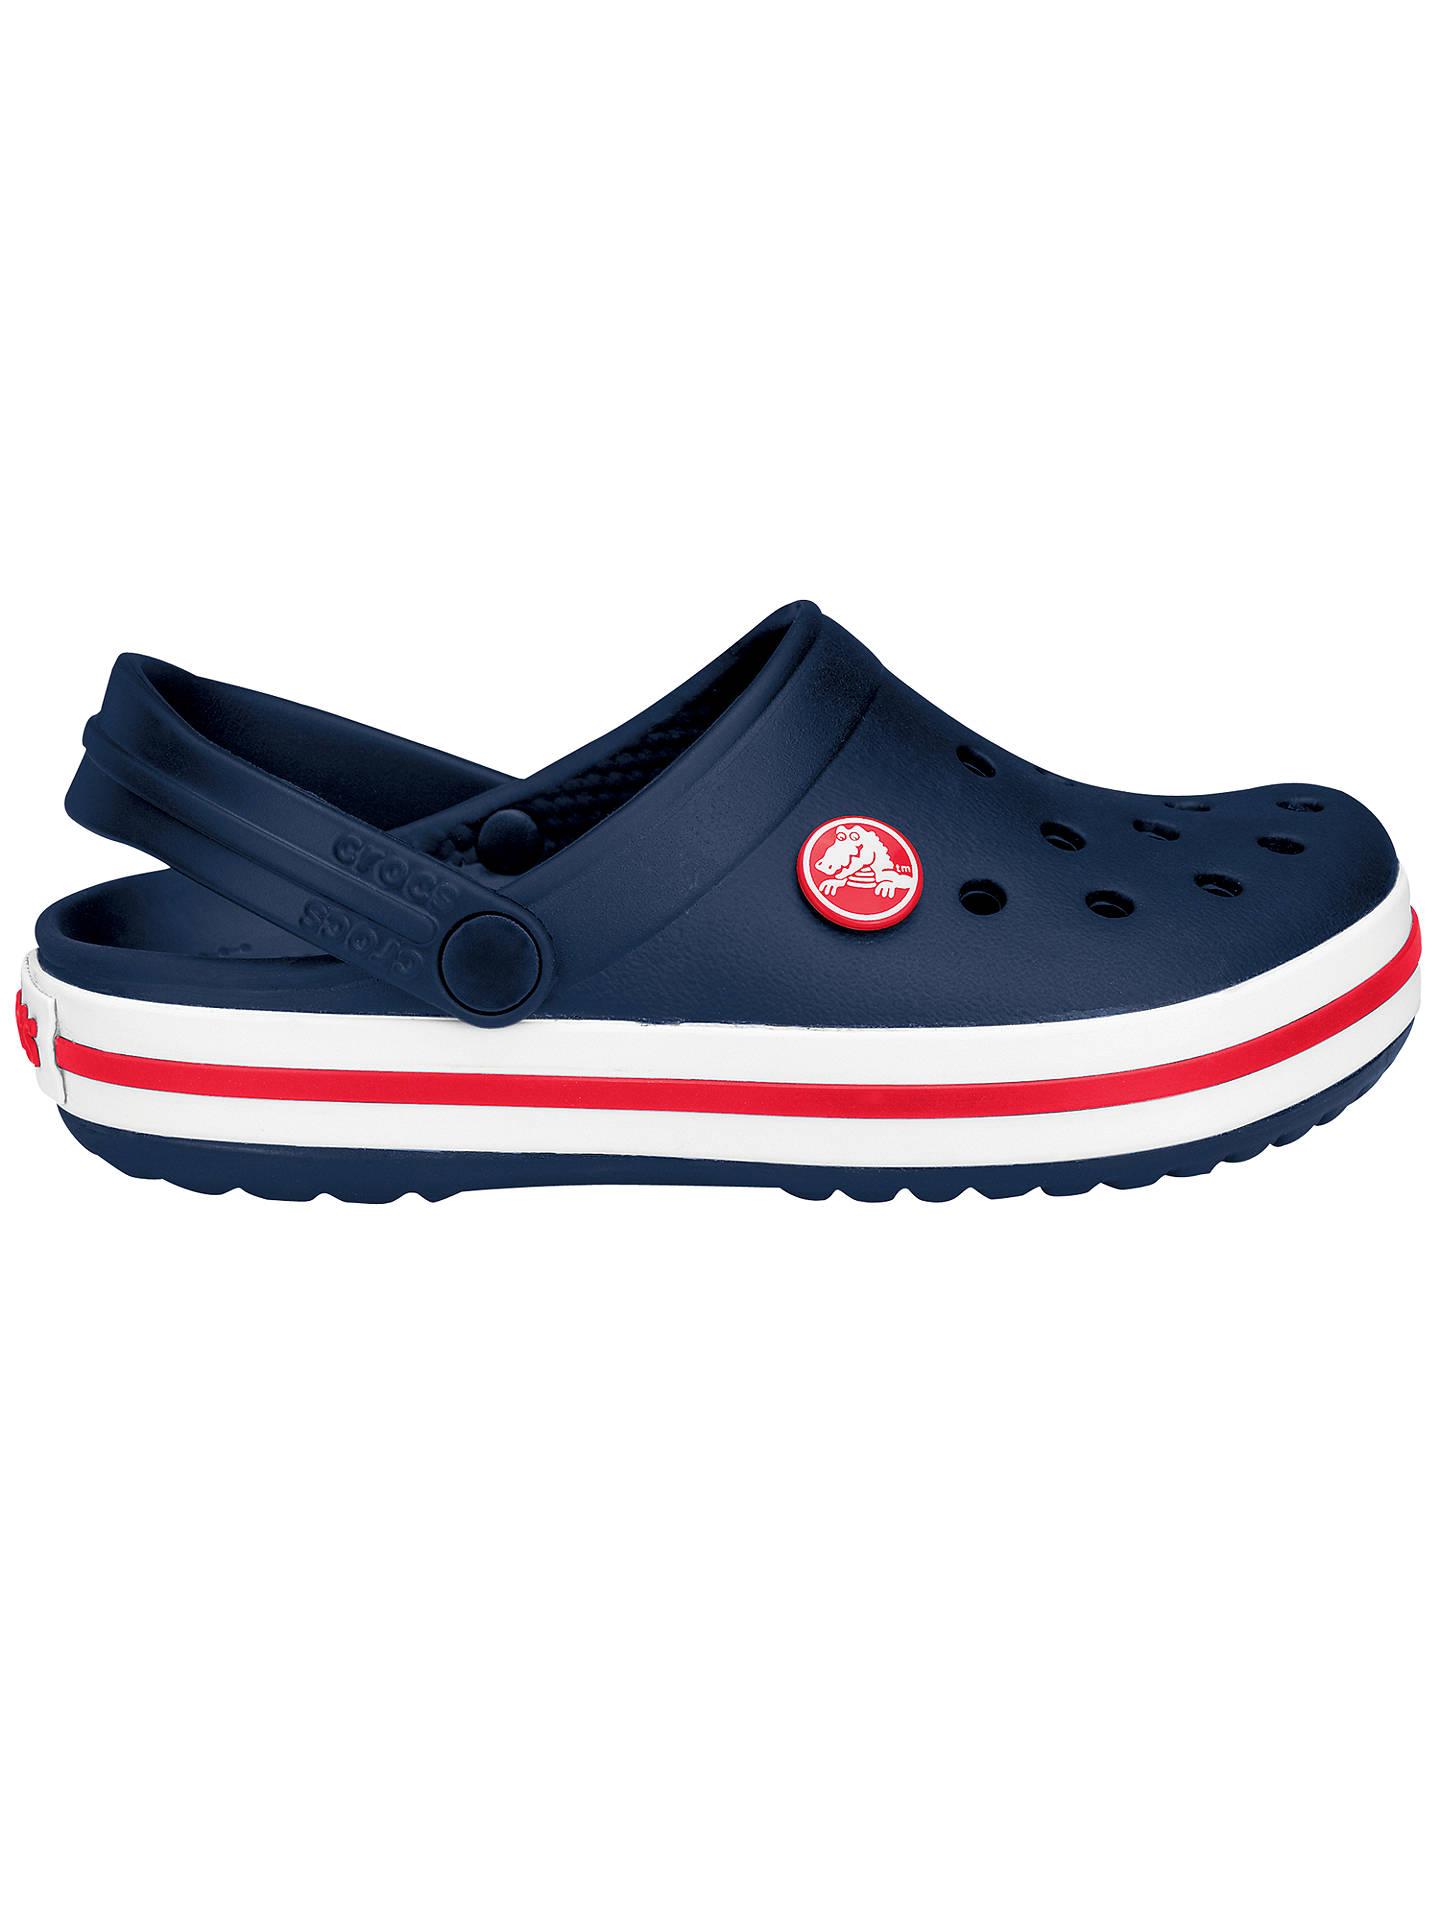 73406192adda Crocs Children s Crocband Clogs at John Lewis   Partners